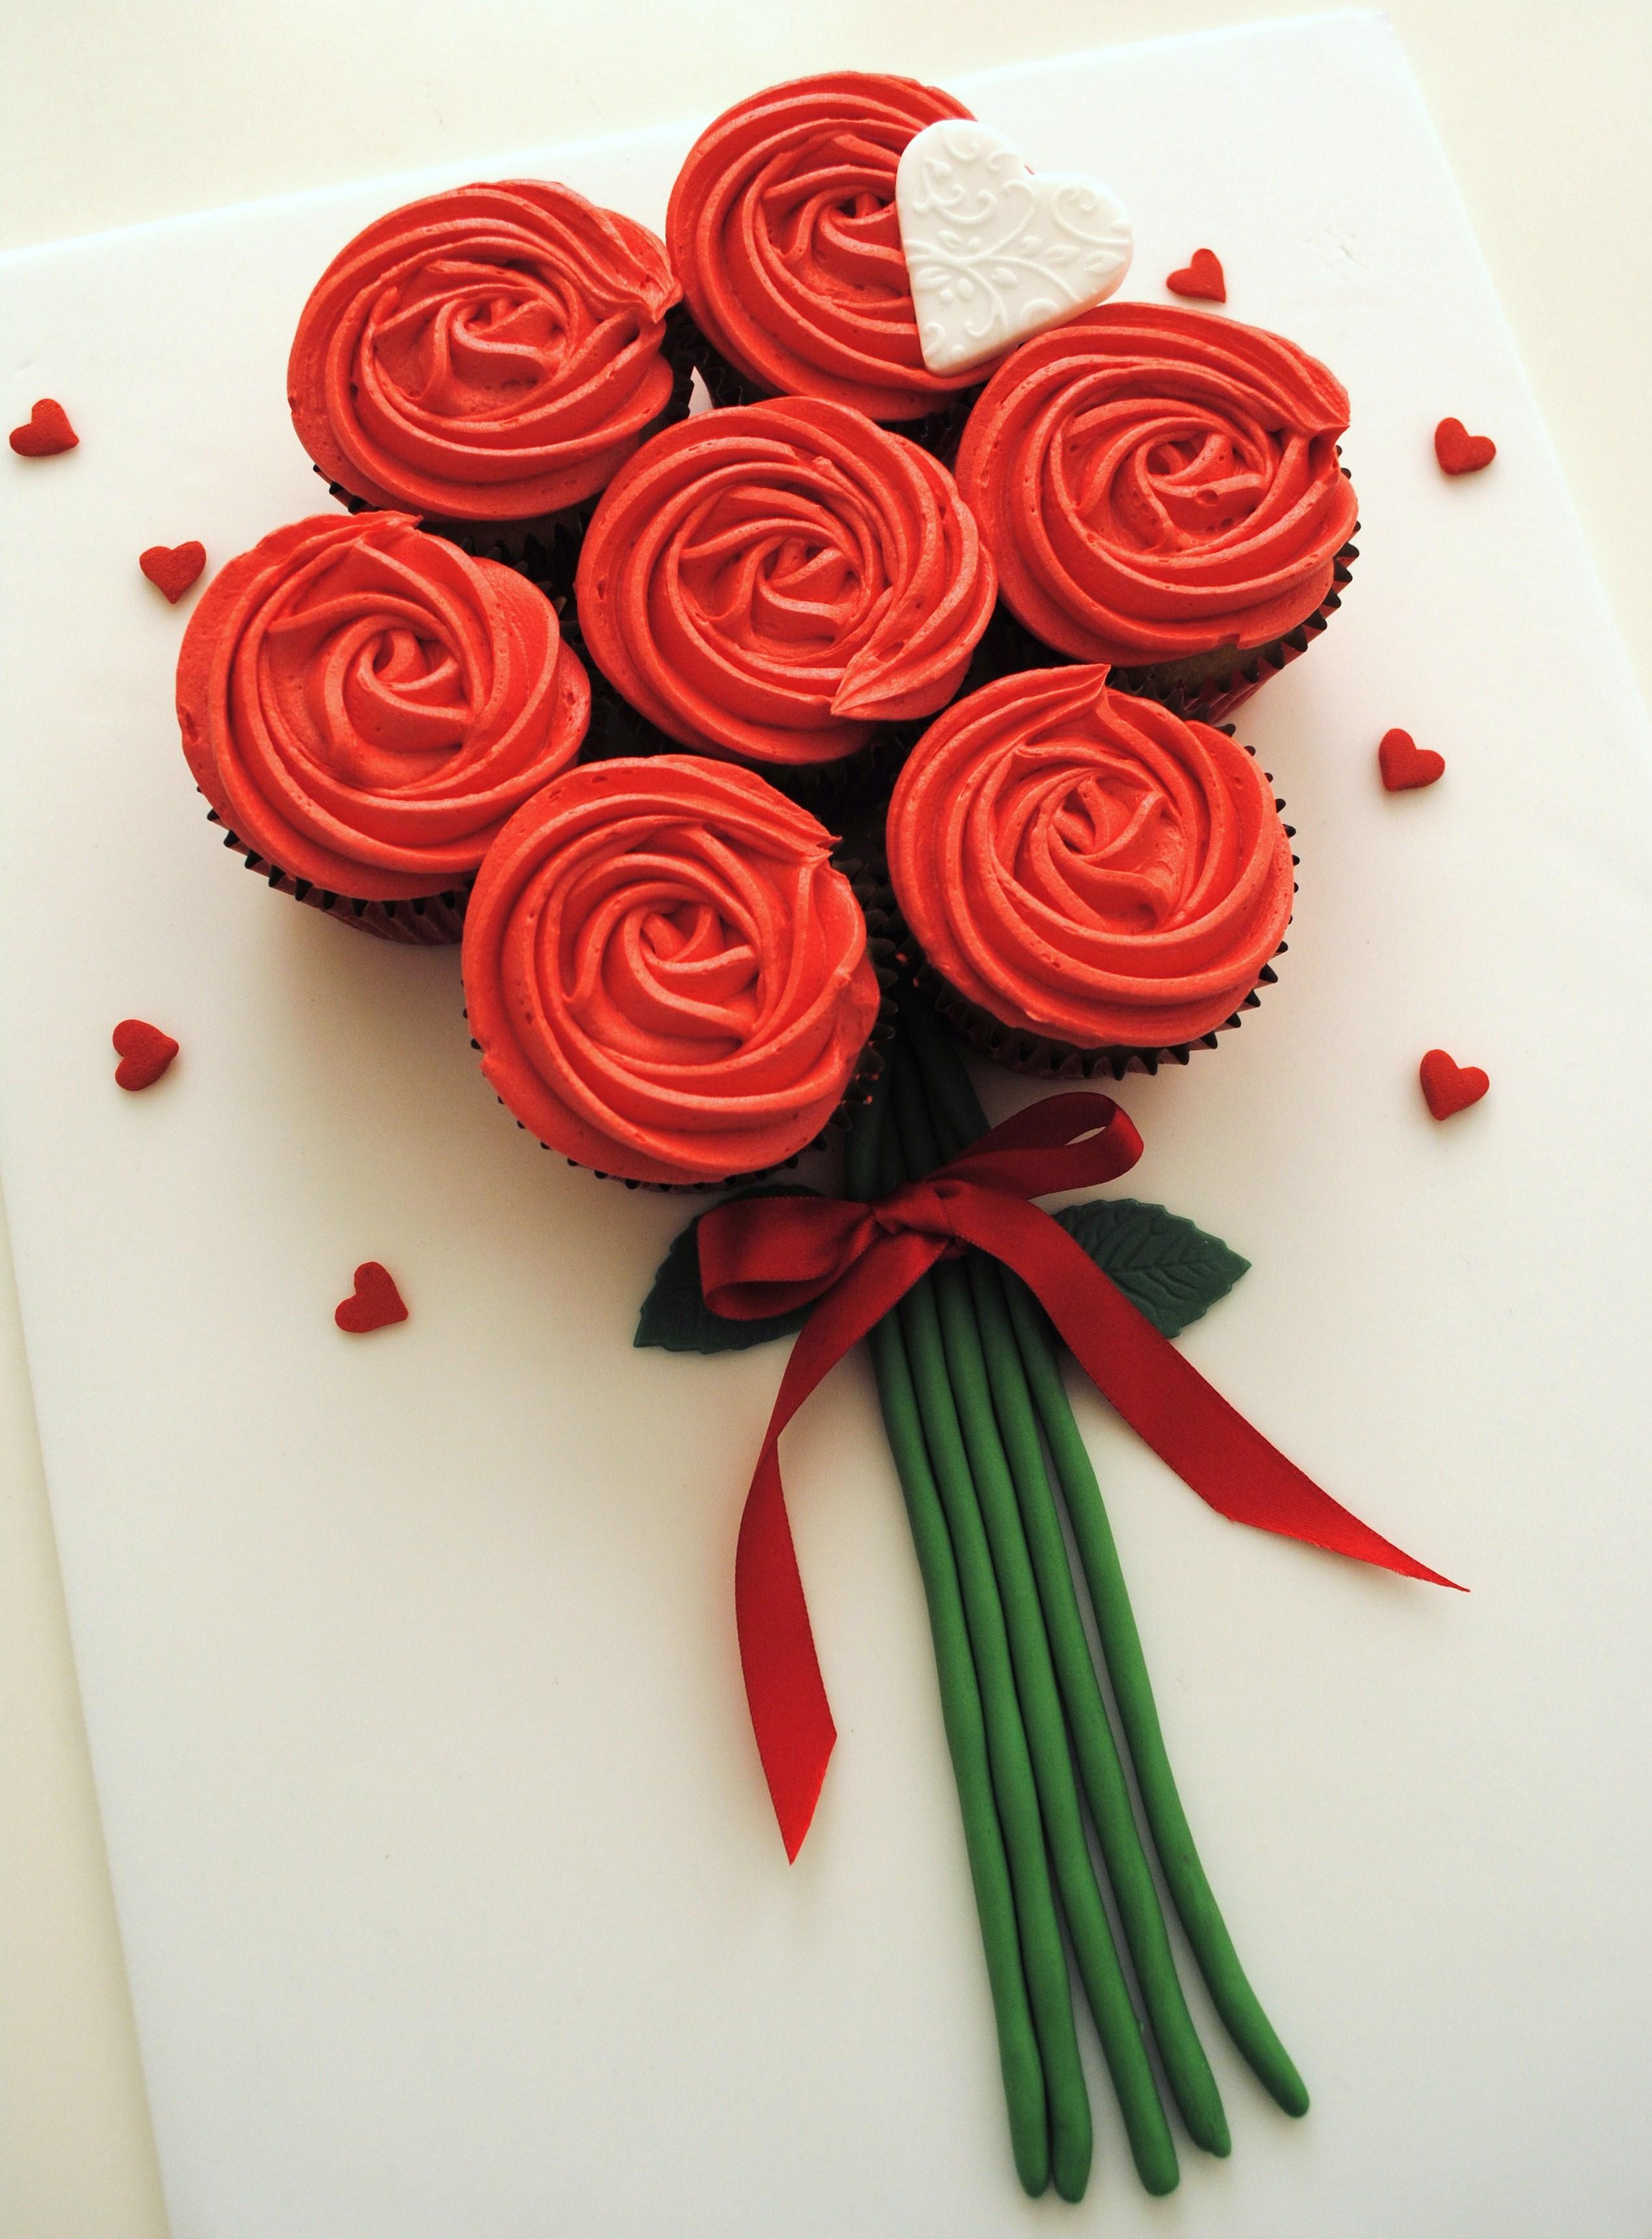 10 valentines flowers cupcakes photo valentine cupcake bouquet valentine cupcake bouquet ideas izmirmasajfo Choice Image